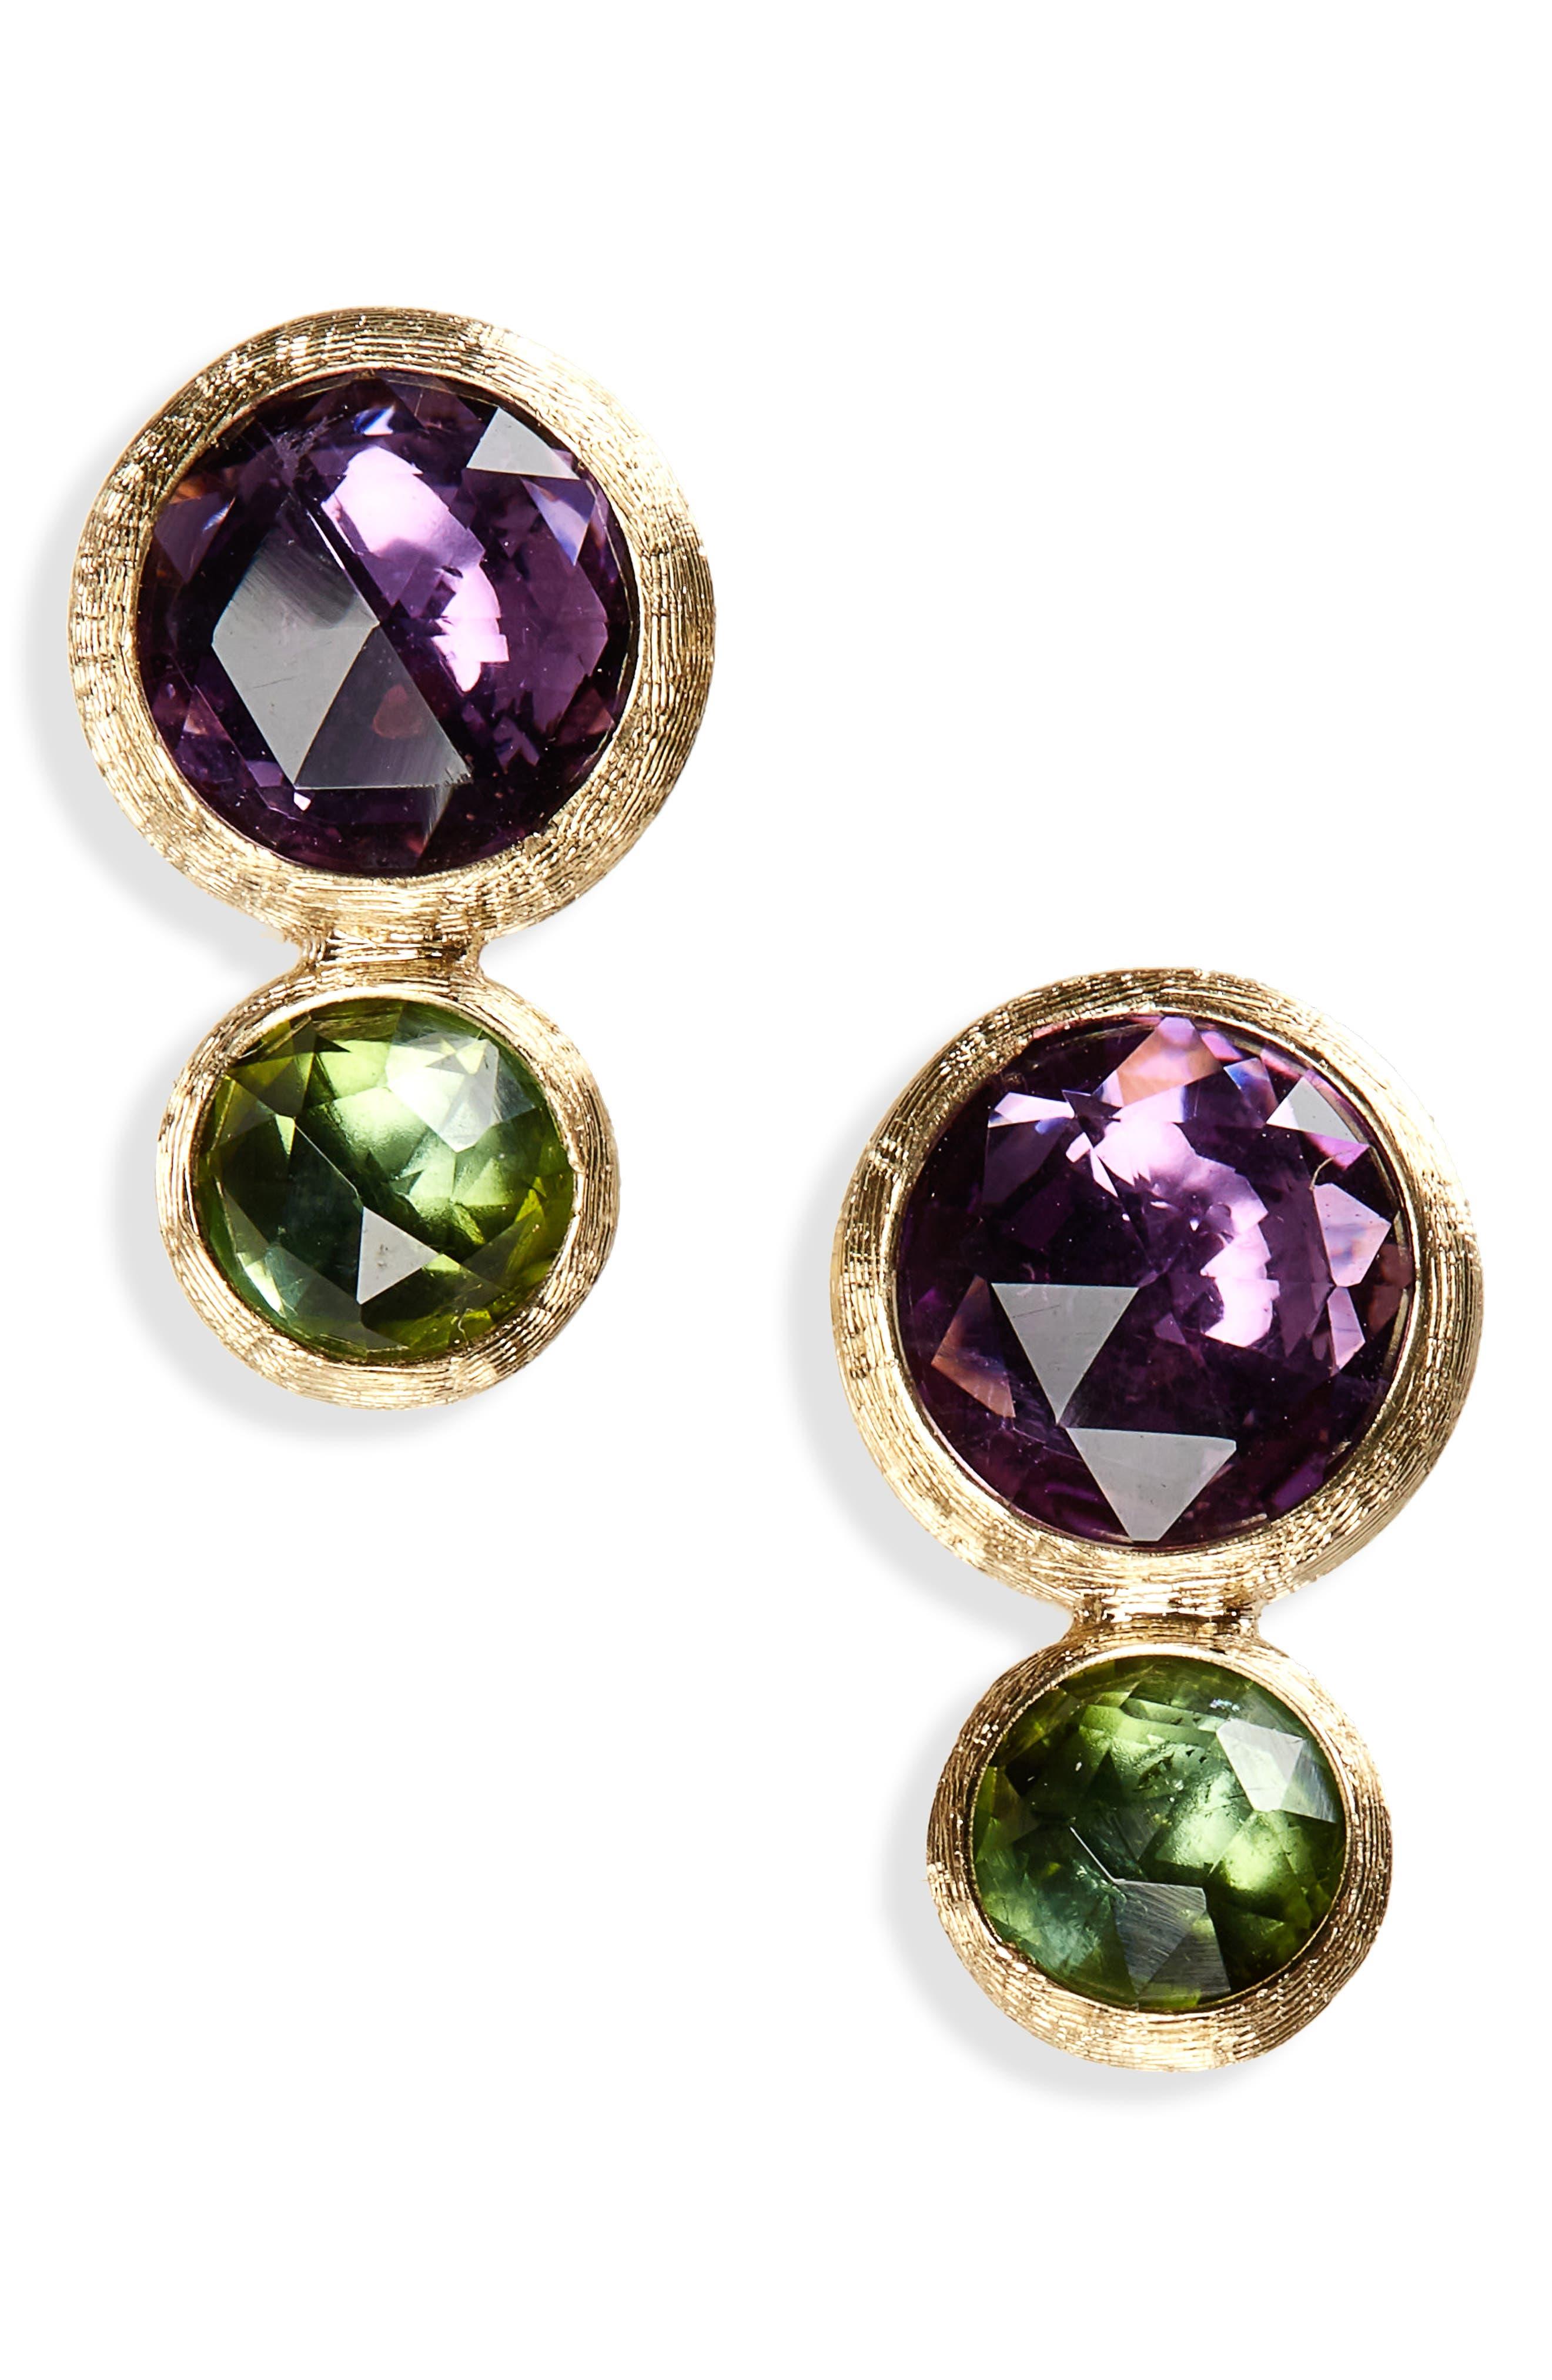 Jaipur Amethyst & Tourmaline Stud Earrings,                         Main,                         color, Yello Gold/ Amethyst